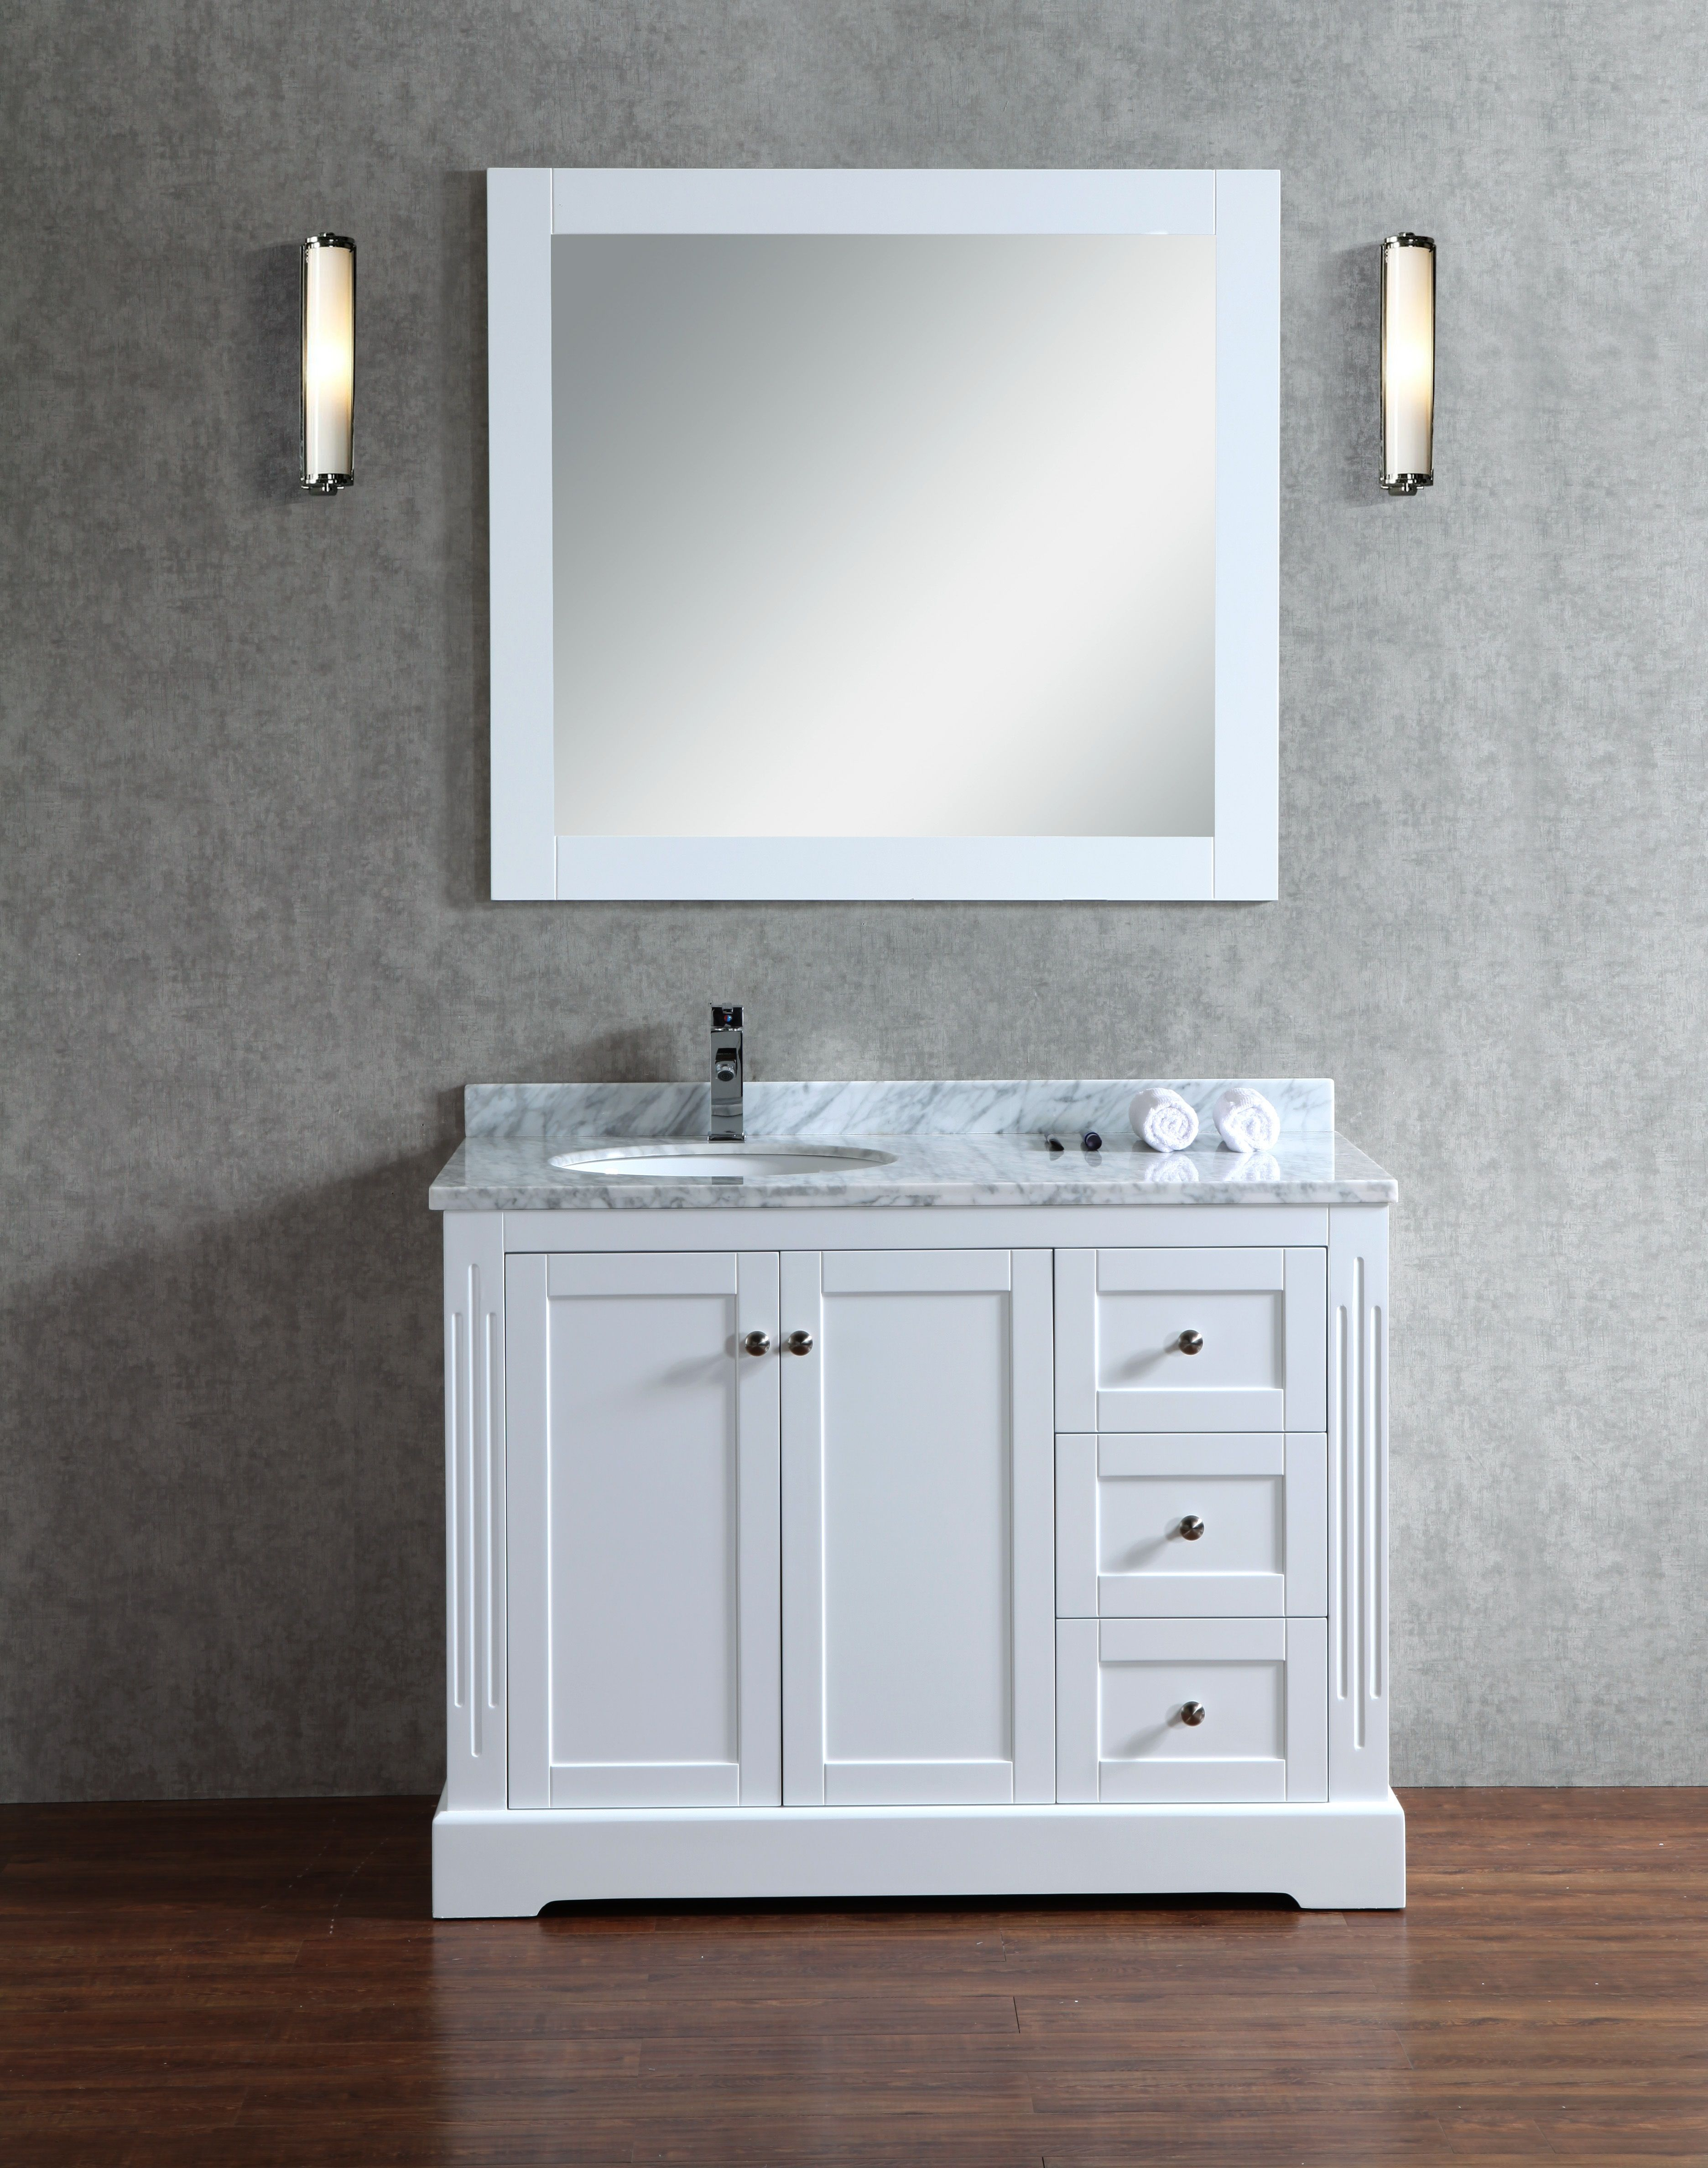 Octans 45 Inch White Vanity Bathroom Vanity Single Sink